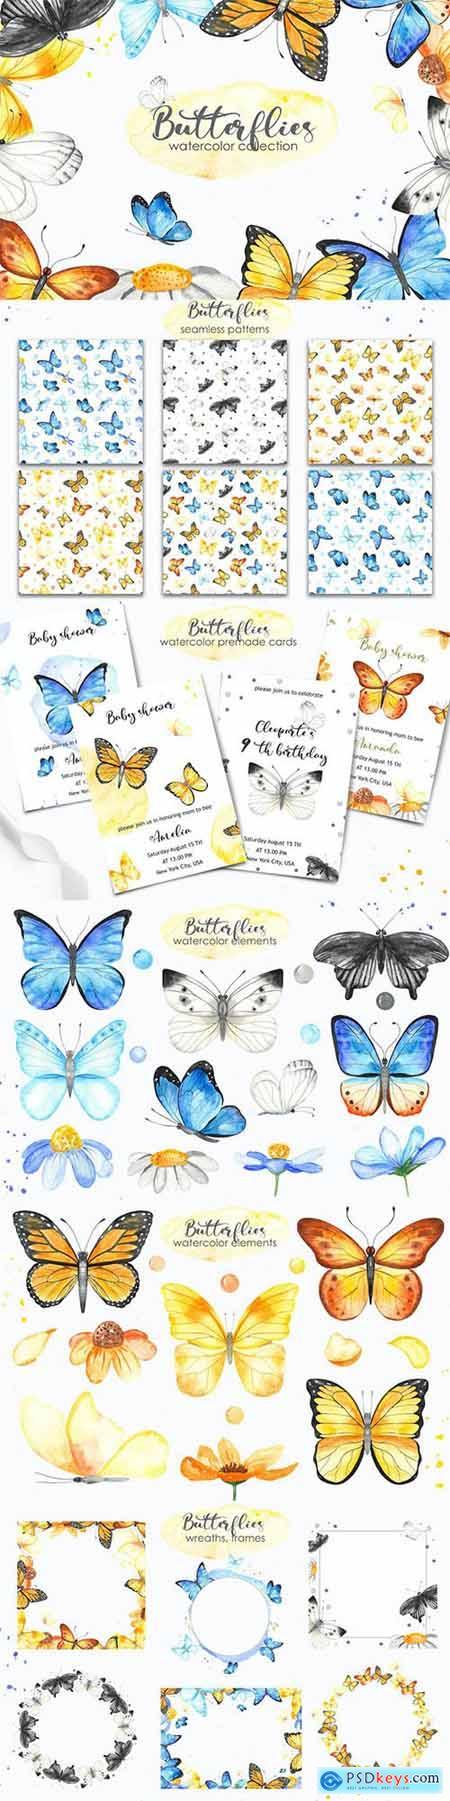 Watercolor Butterflies Clipart, cards, frames